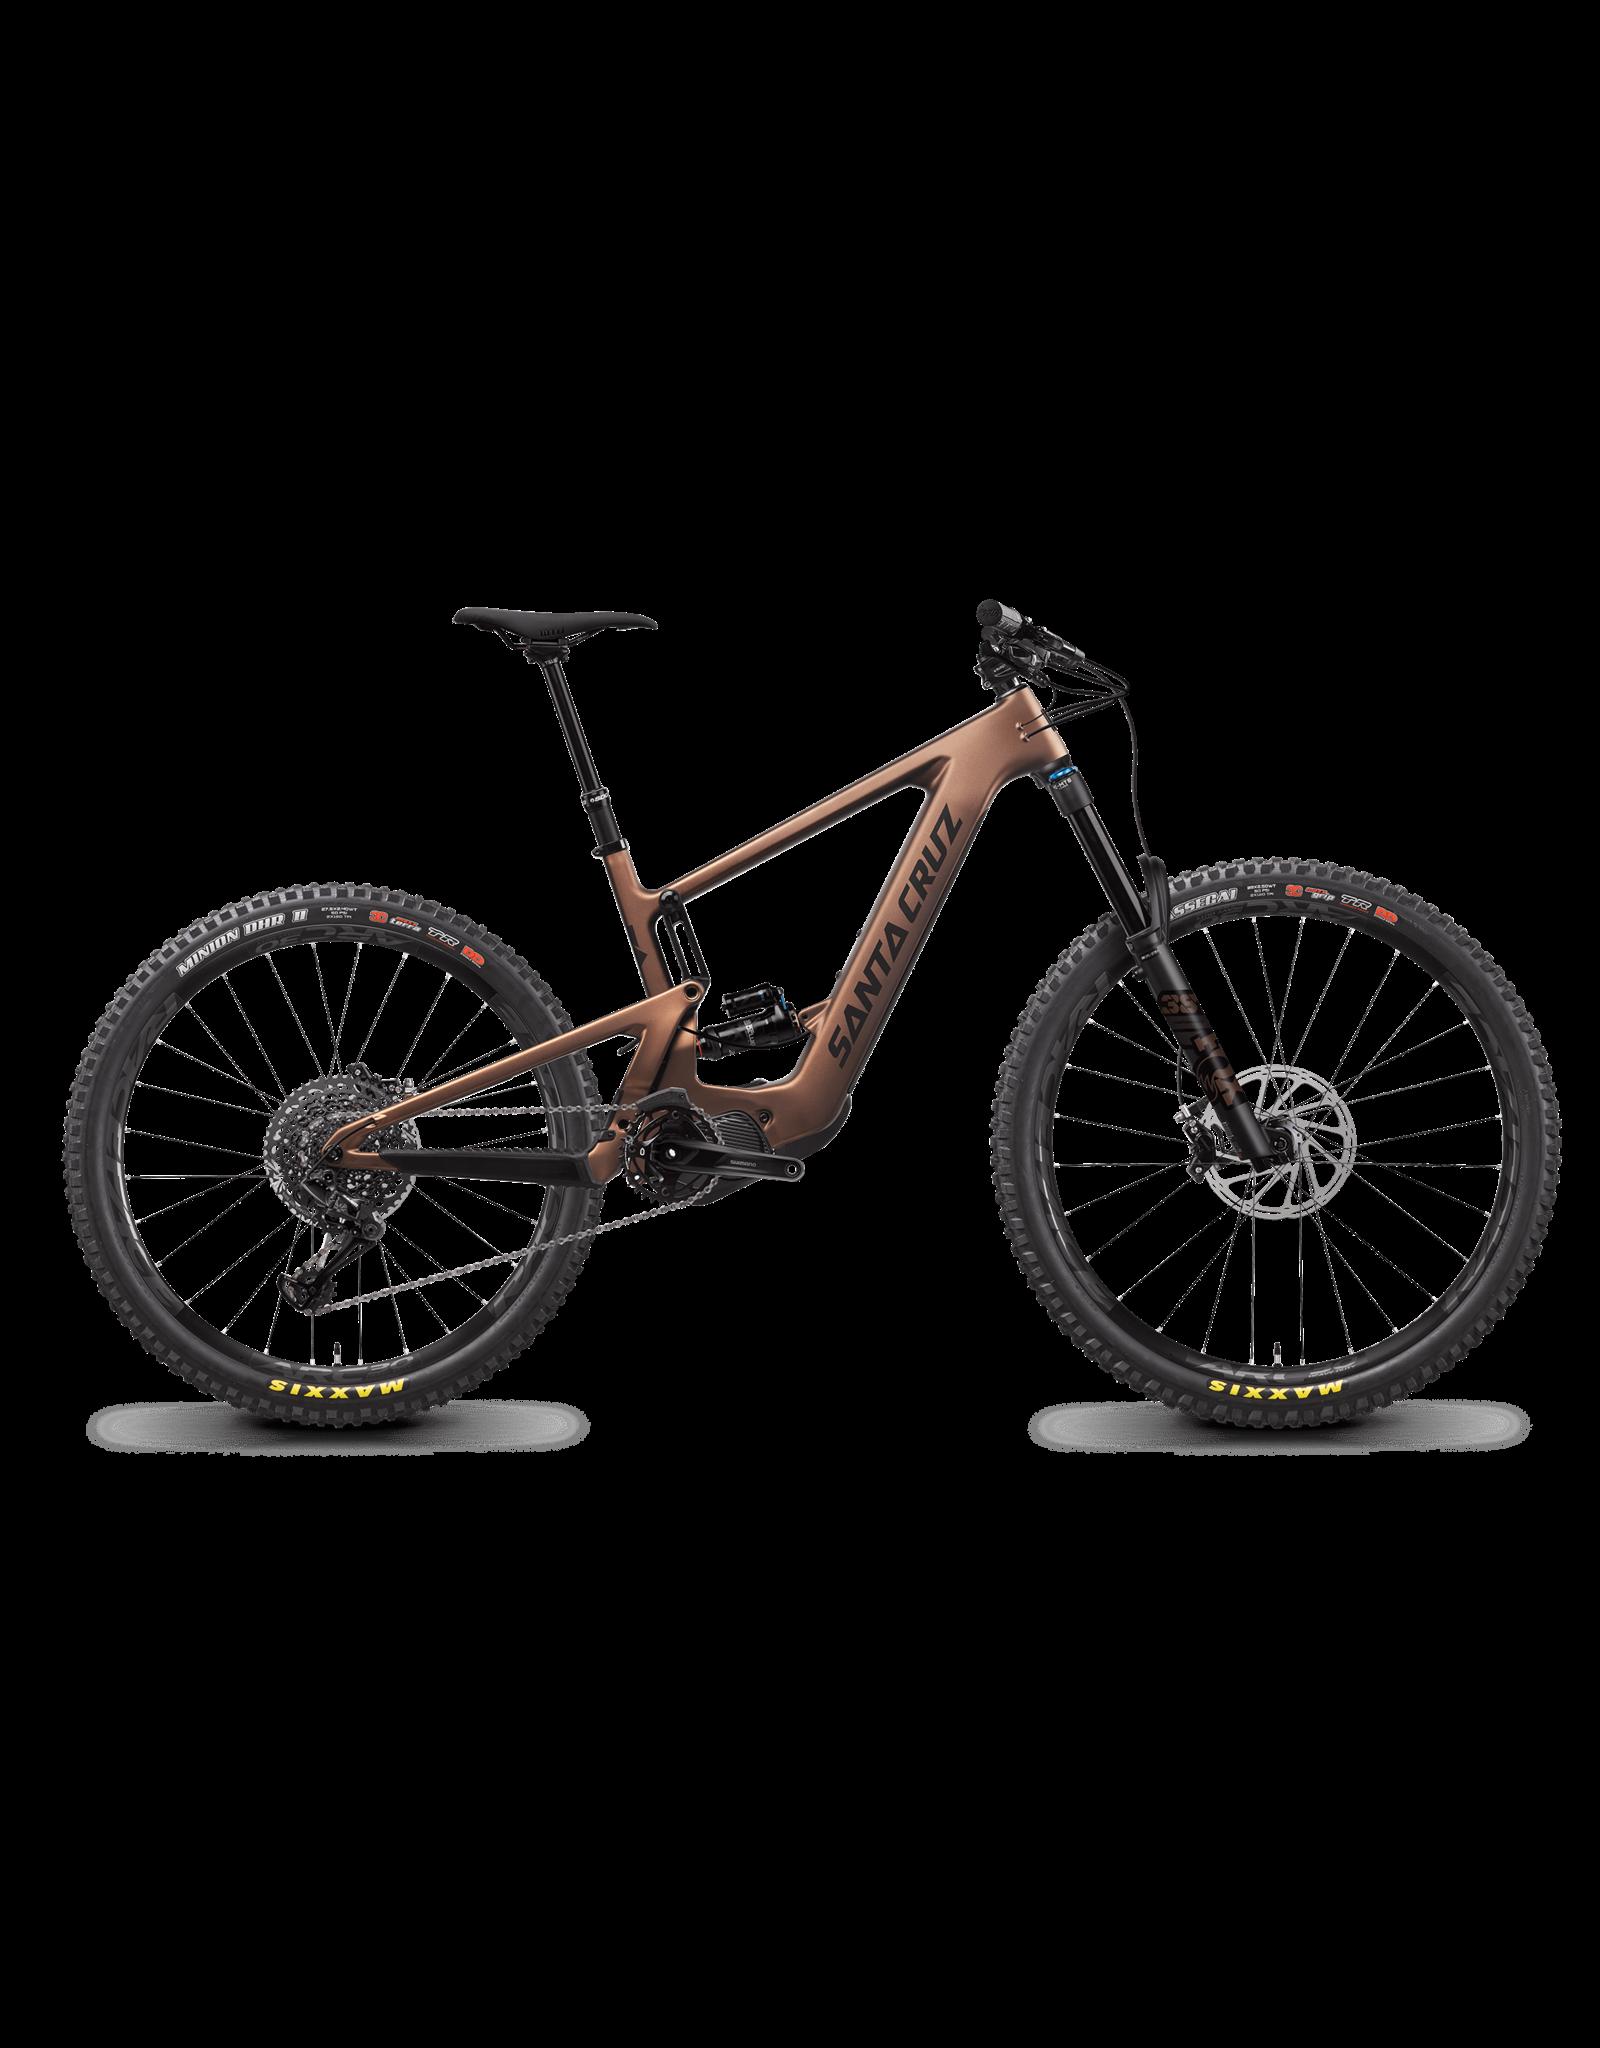 Santa Cruz Bicycles Bullit CC MX S-Kit Size LG, Copper USA